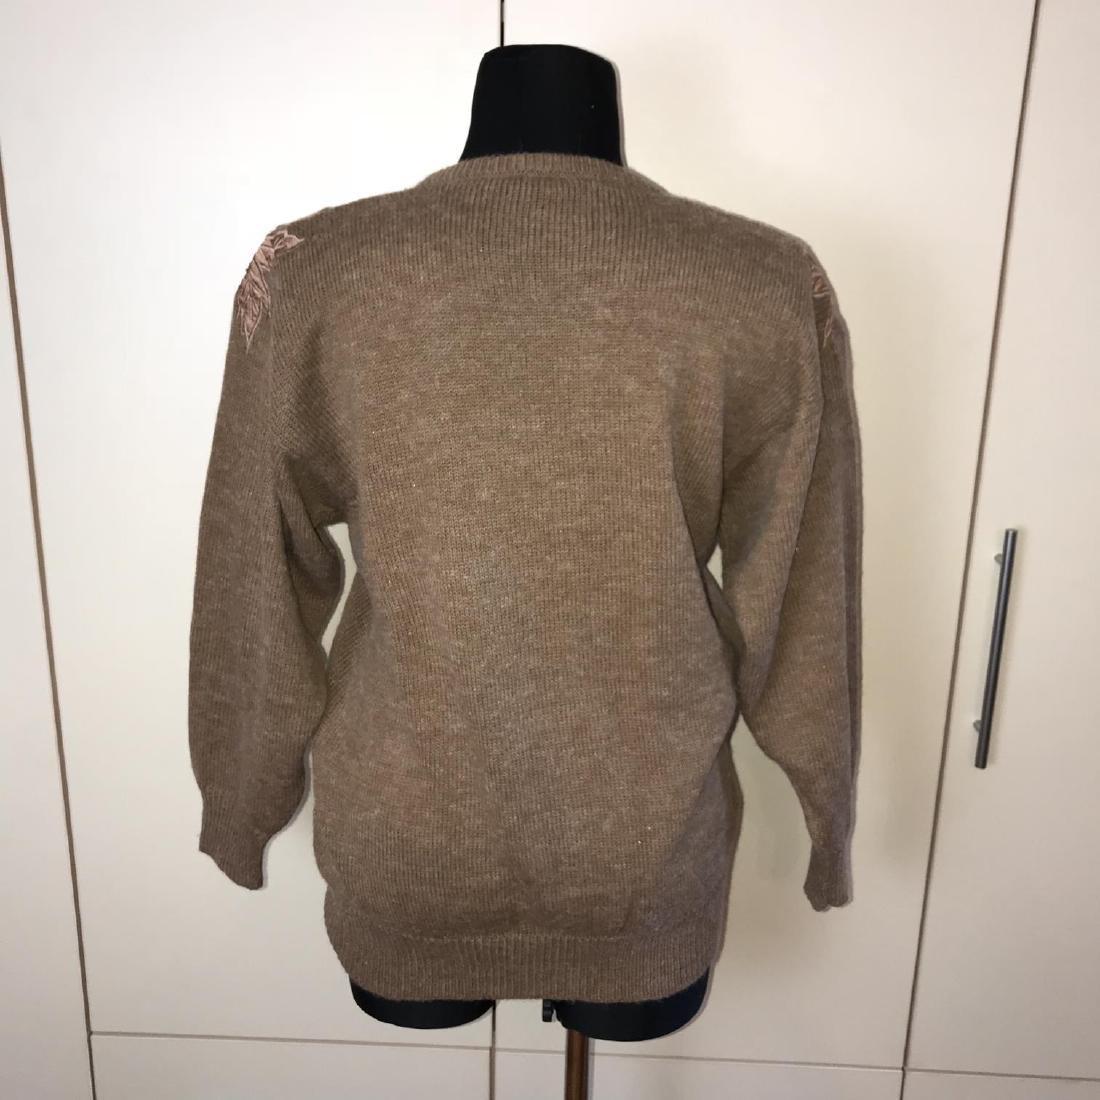 Vintage Women's Oversized Sweater Size EUR 40 US 10 - 5